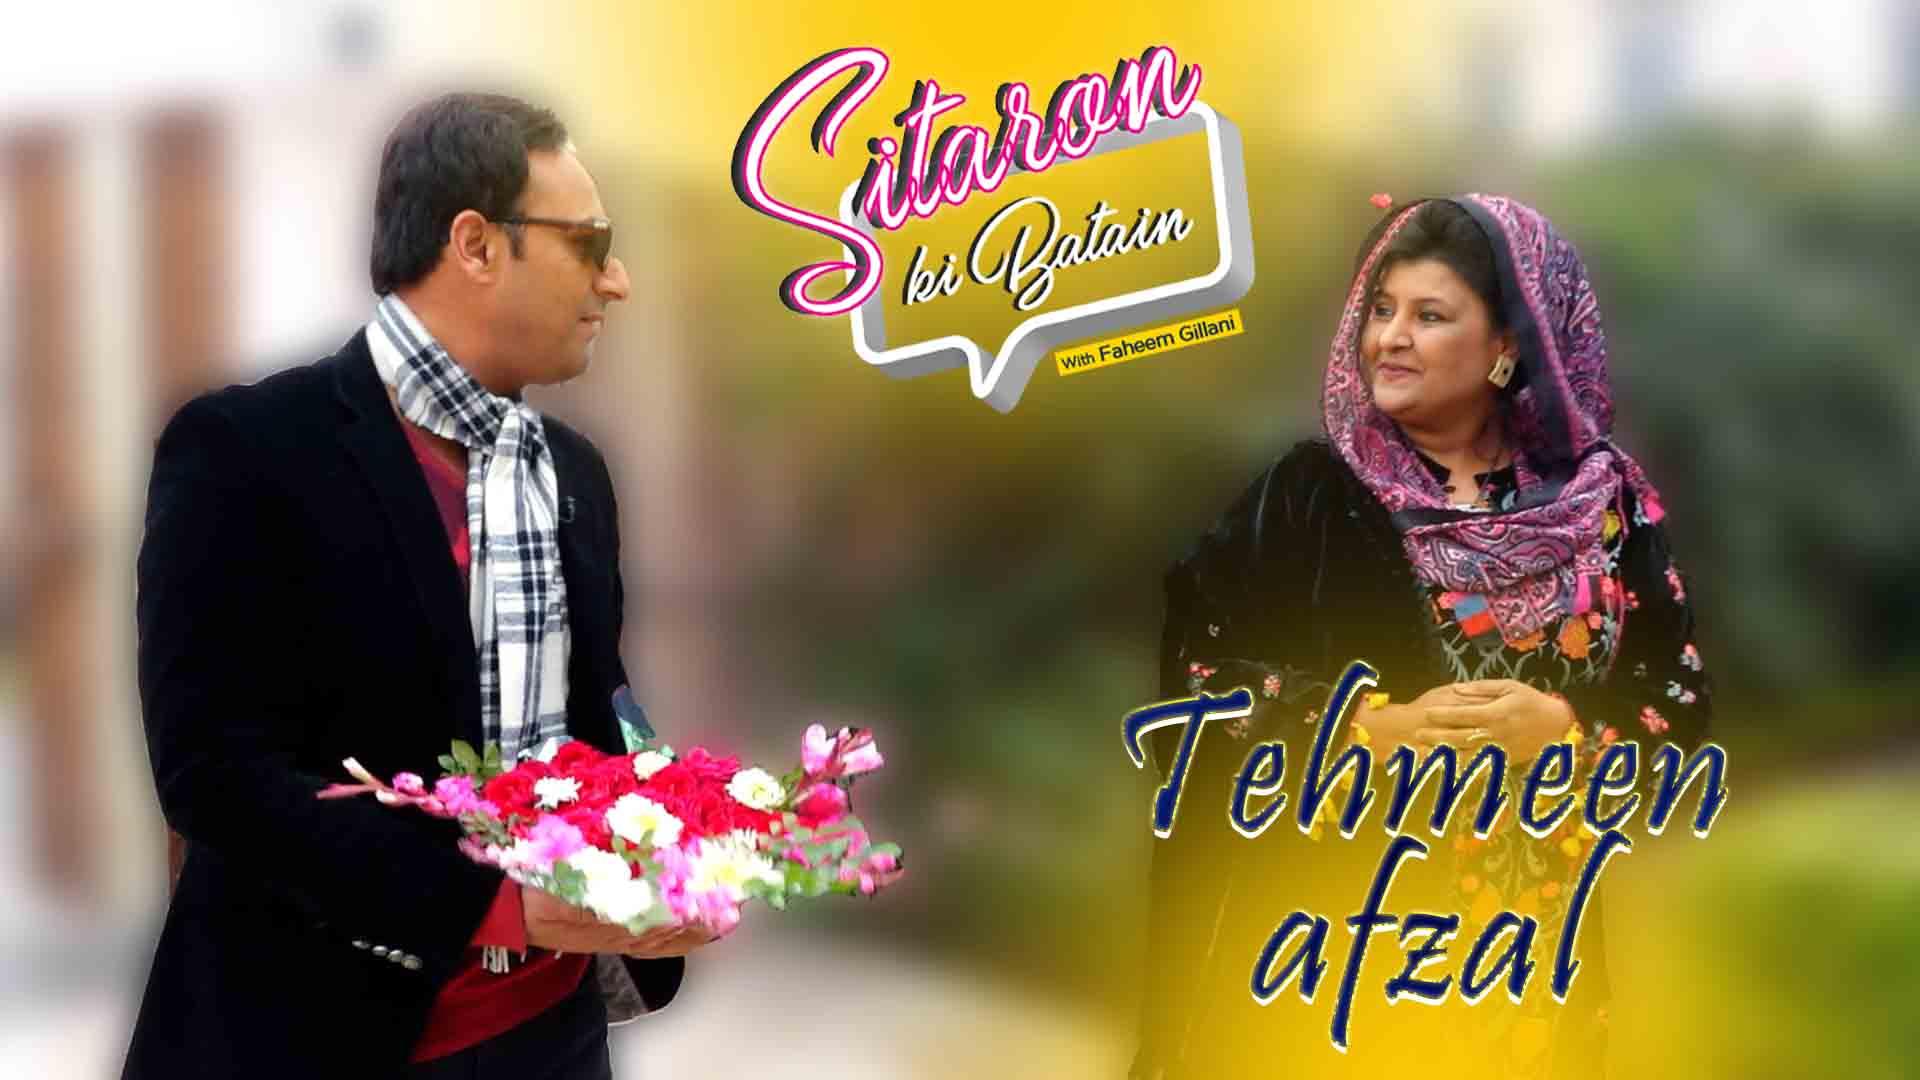 a-legendary-conversation-with-tehmeena-afzal-sitaron-ki-batain-with-faheem-gilani-9-news-hd